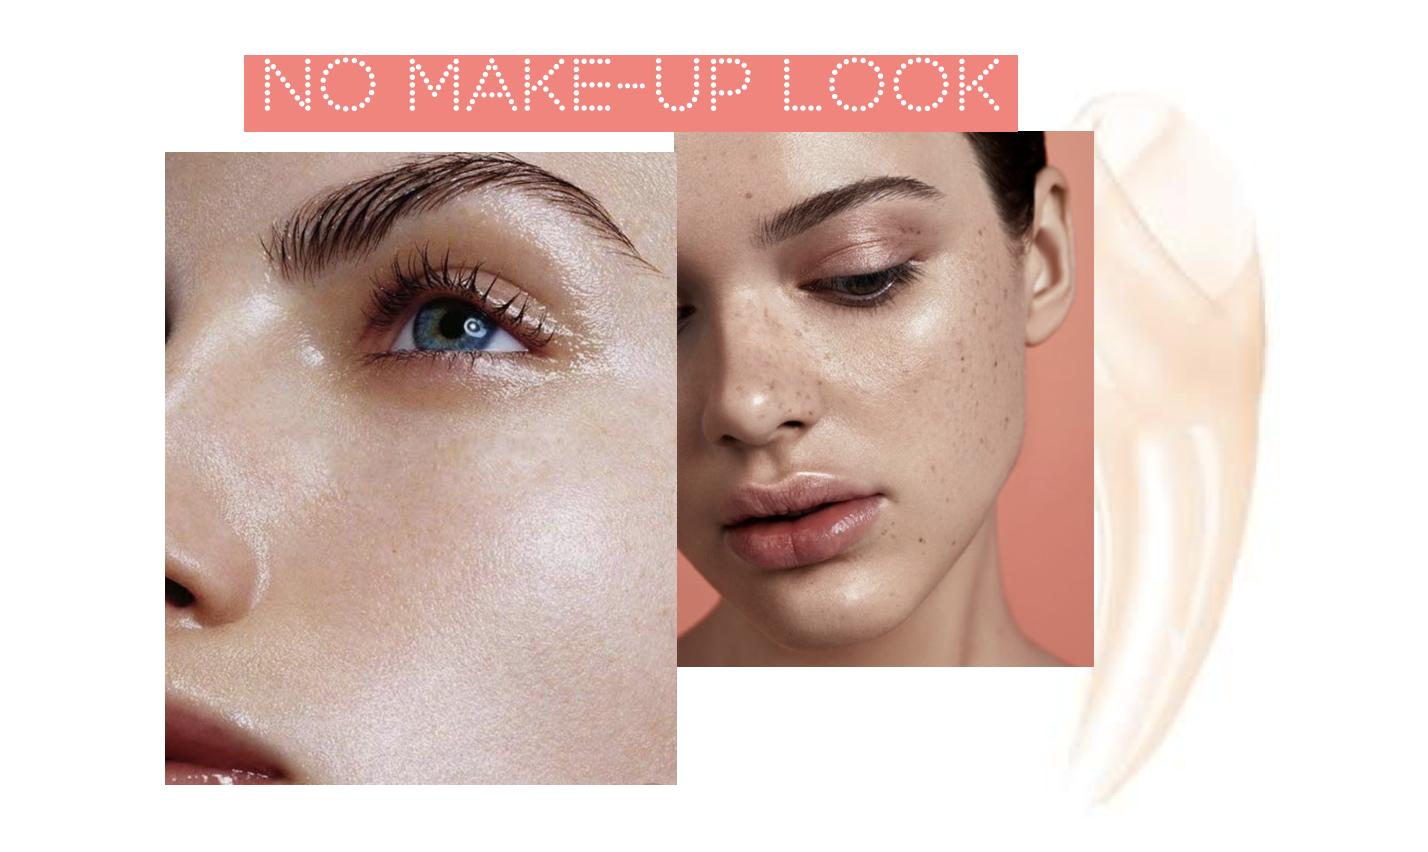 tendance maquillage no make-up